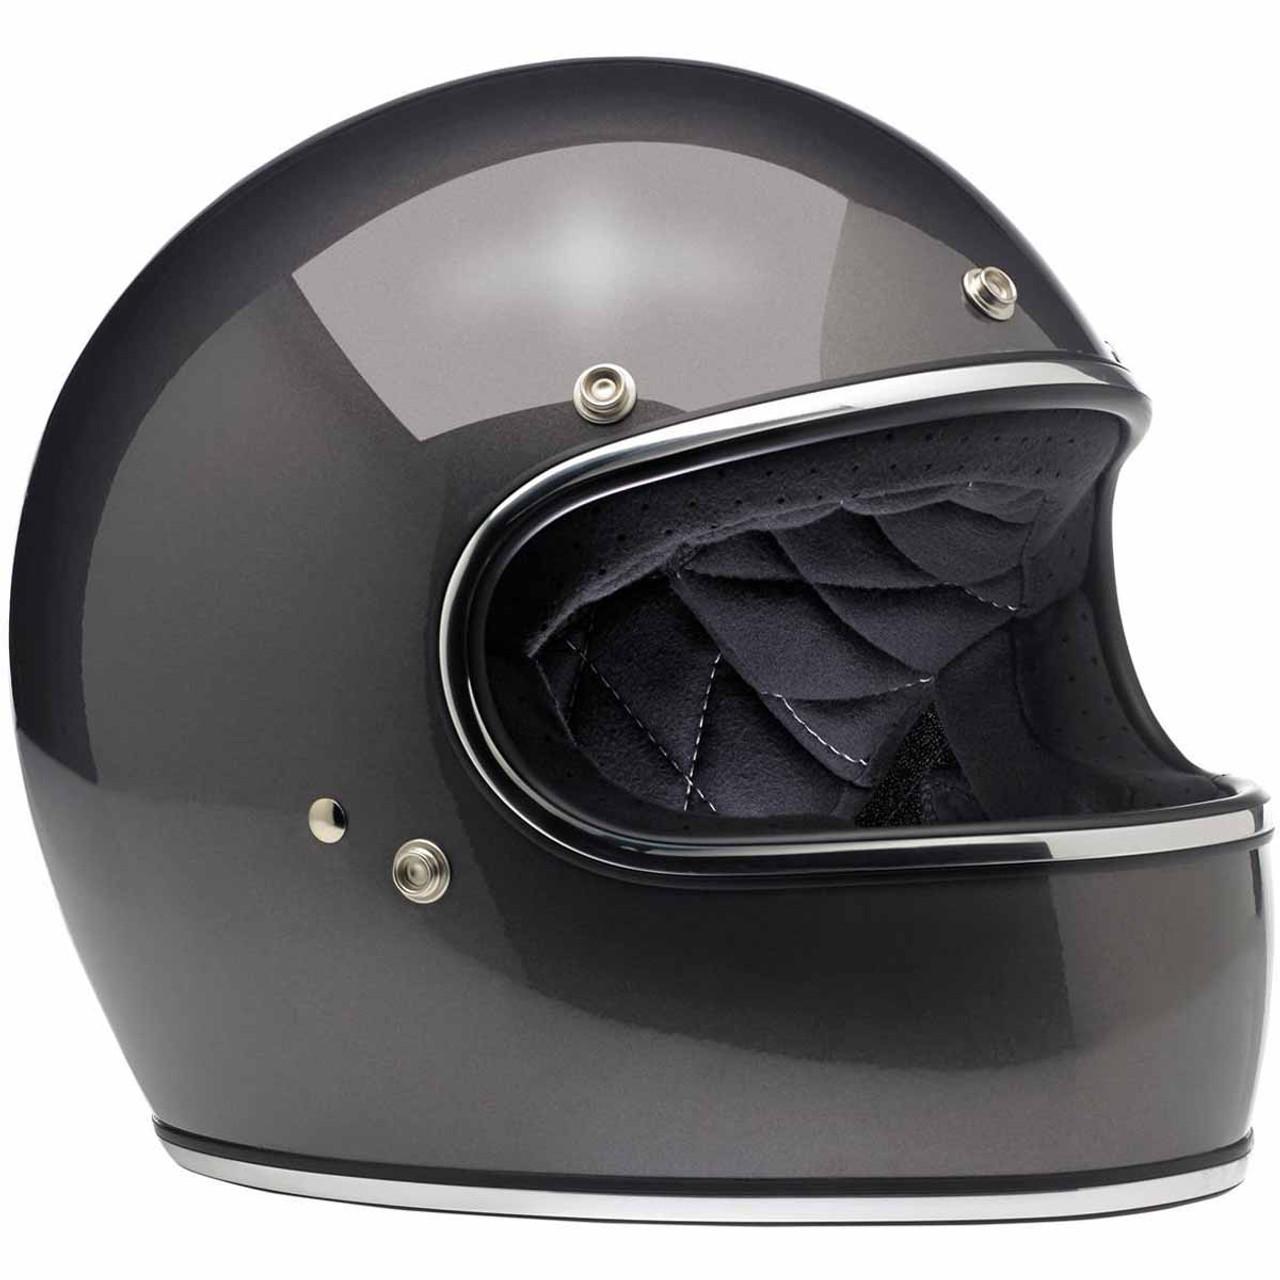 Metallic Bourbon SALE Biltwell Gringo Full Face Retro Helmet SALE